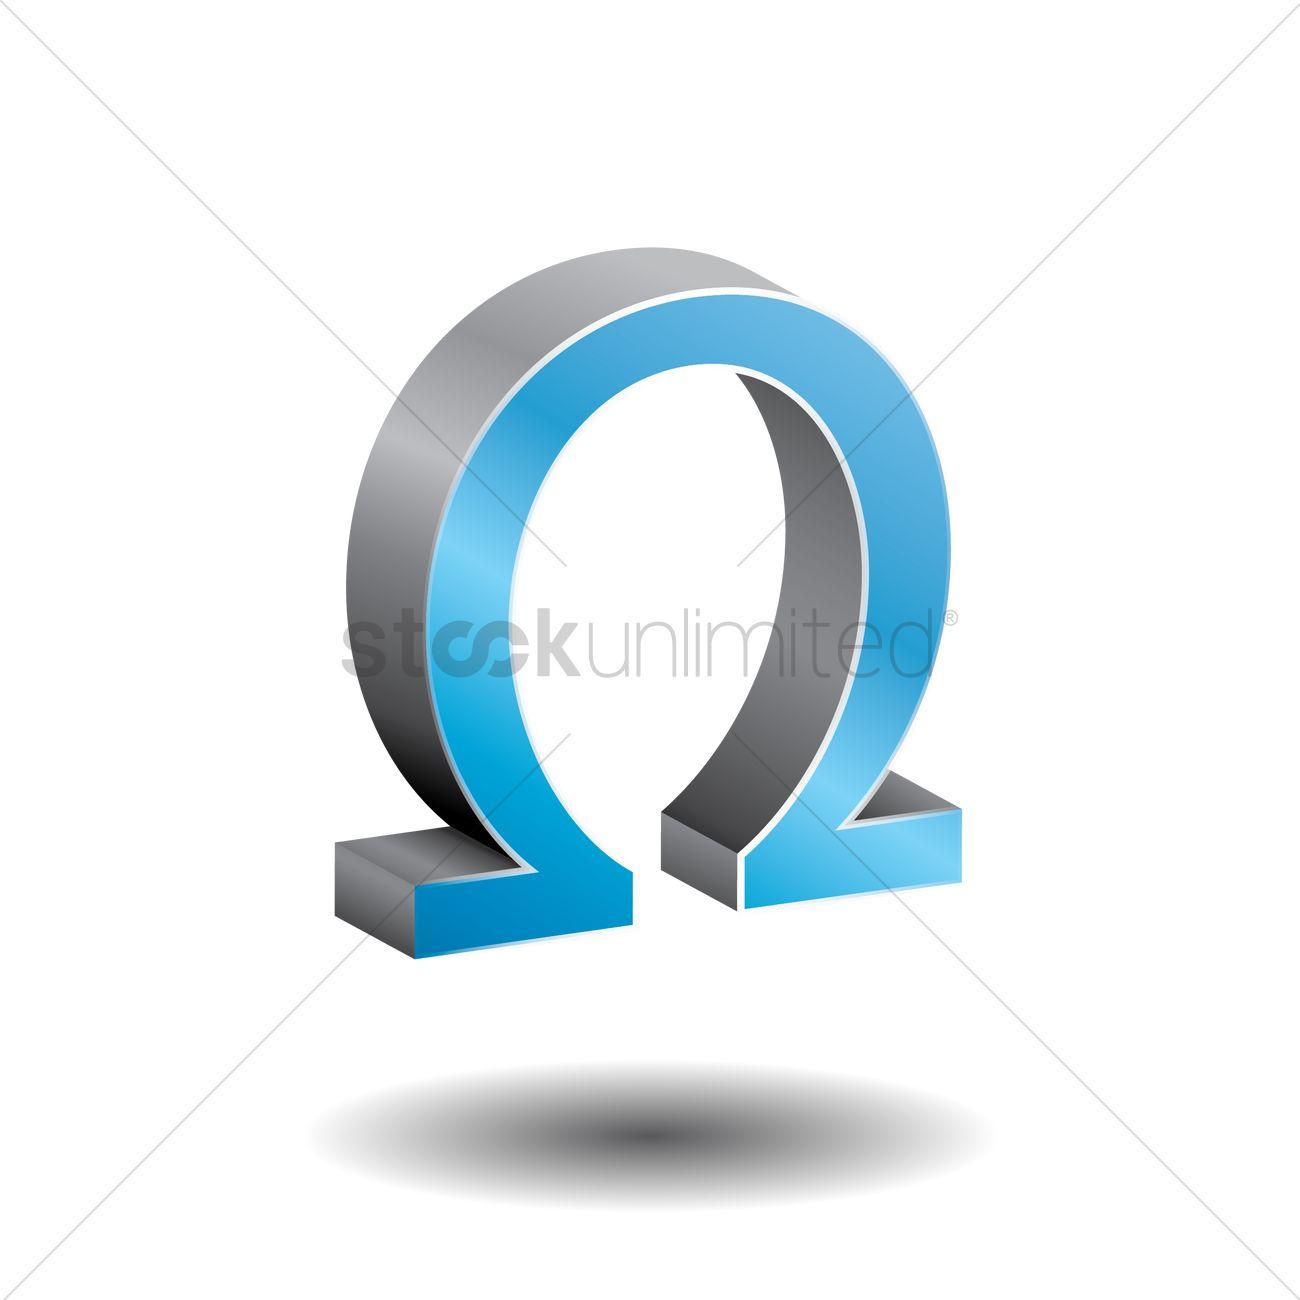 Omega symbol vector image 1821487 stockunlimited omega symbol vector graphic biocorpaavc Gallery